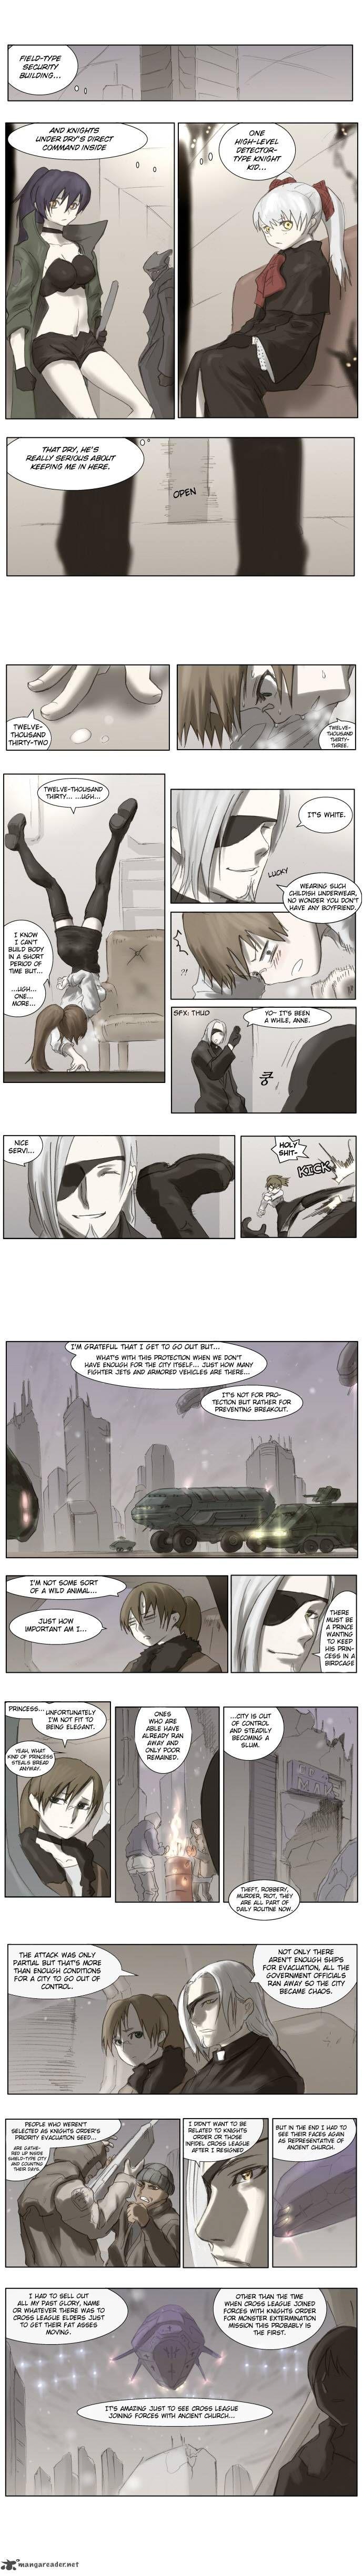 Knight Run 30 Page 2